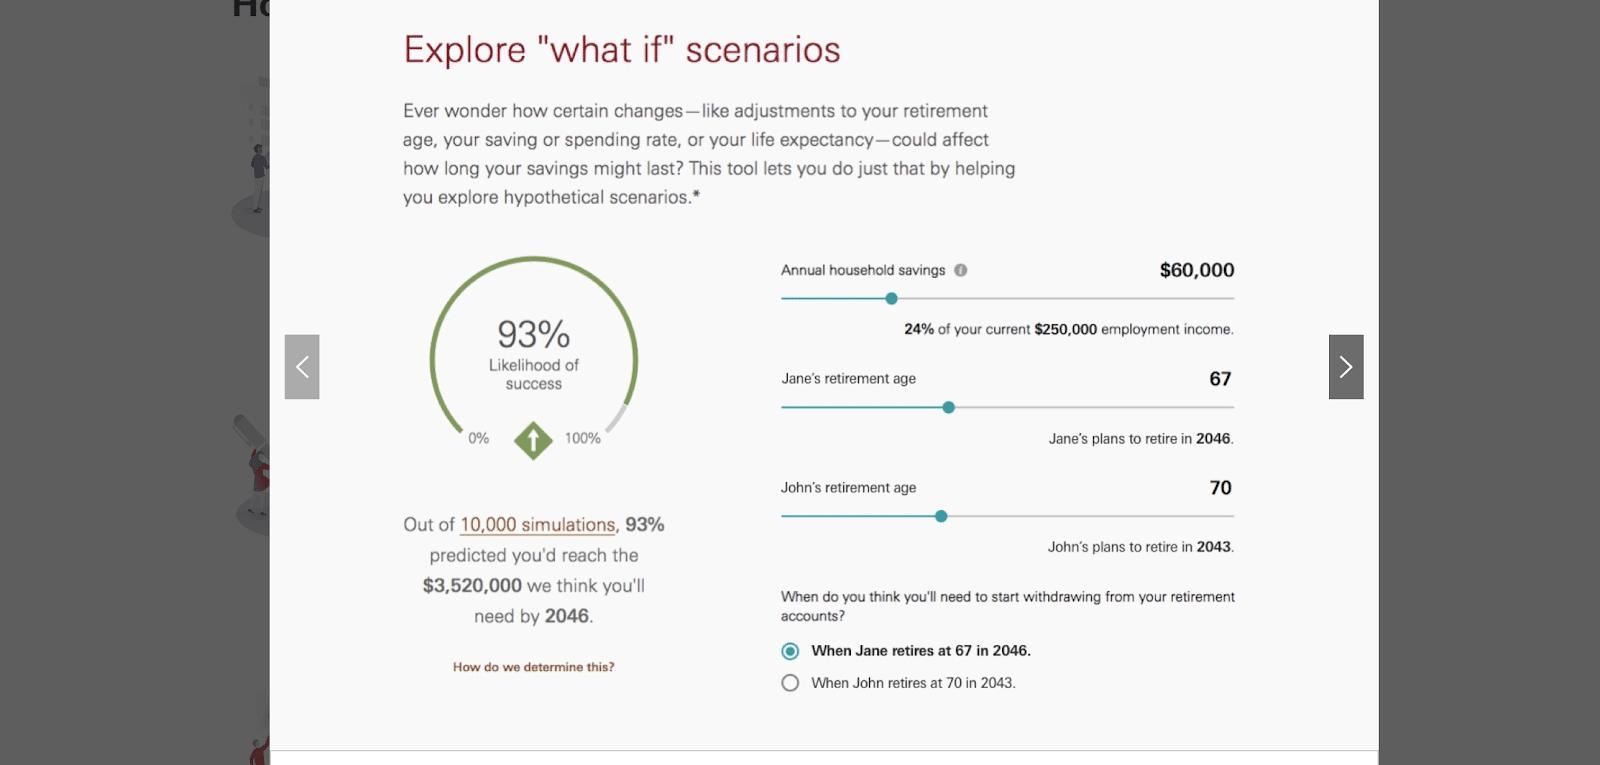 vanguard exploring what if scenarios for clients